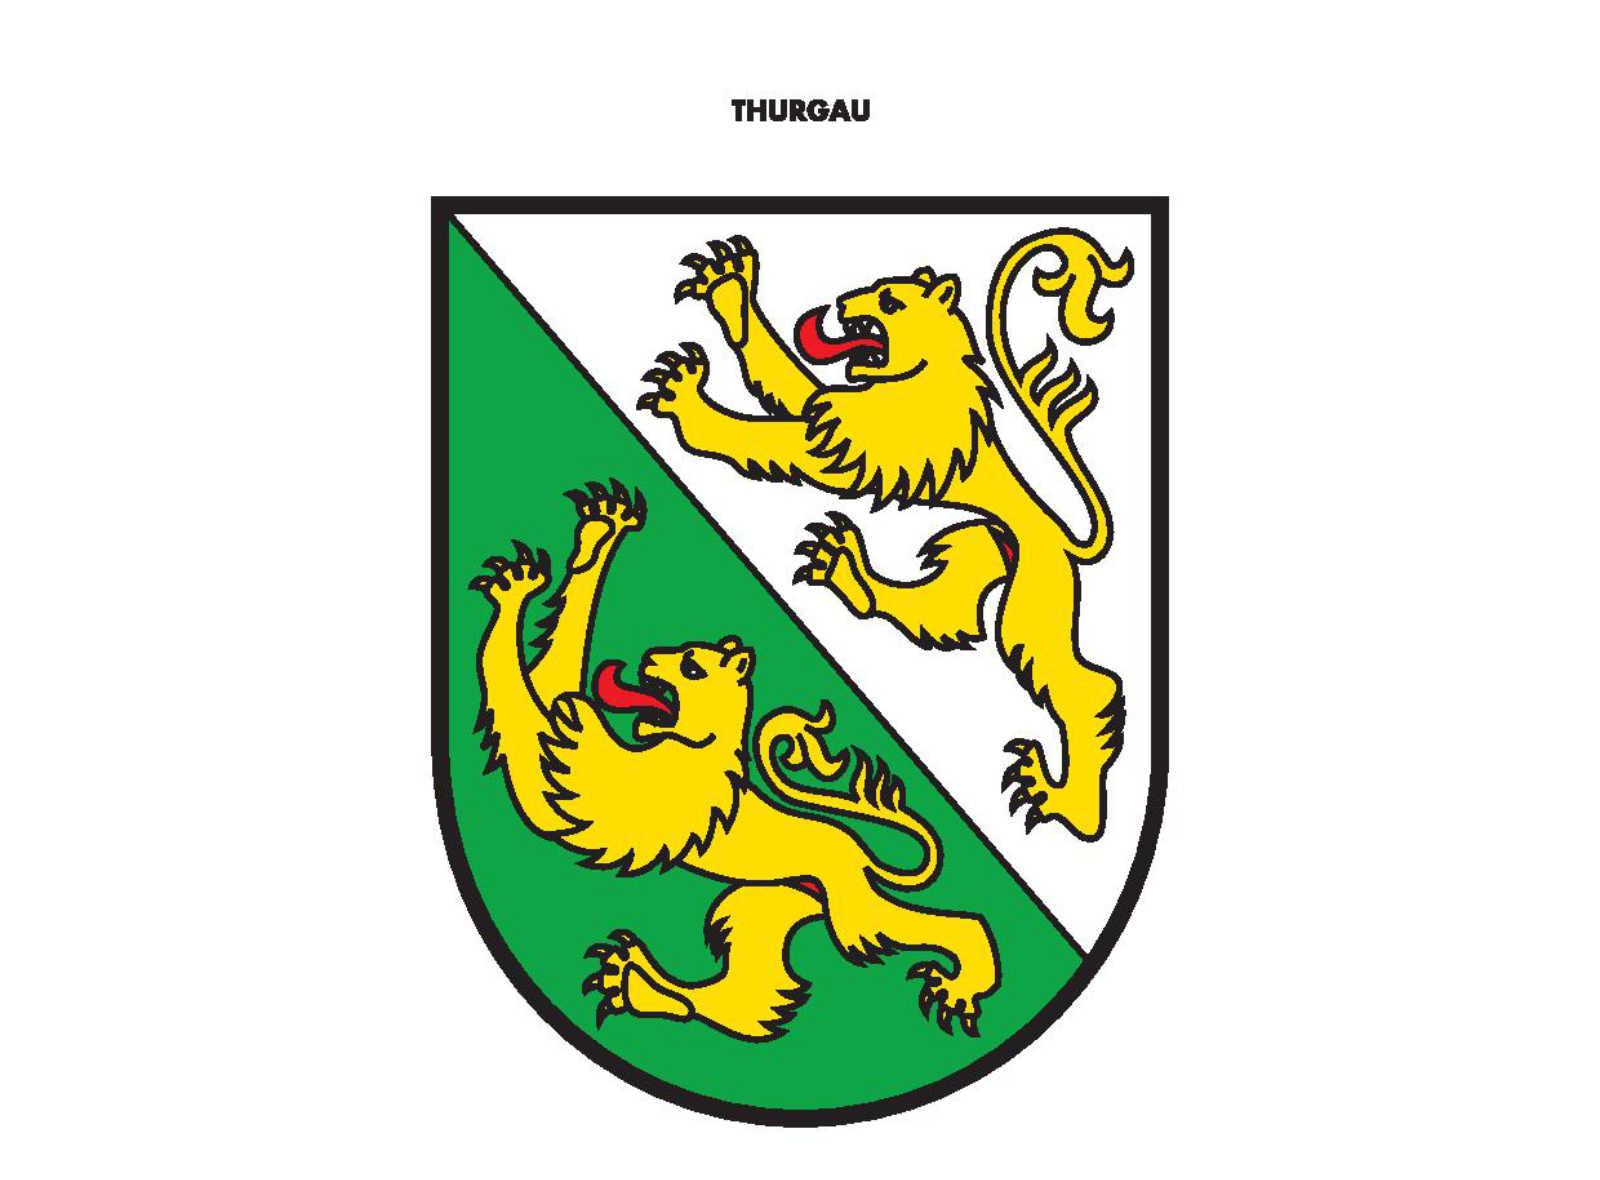 Schweizer Kantone – Thurgau